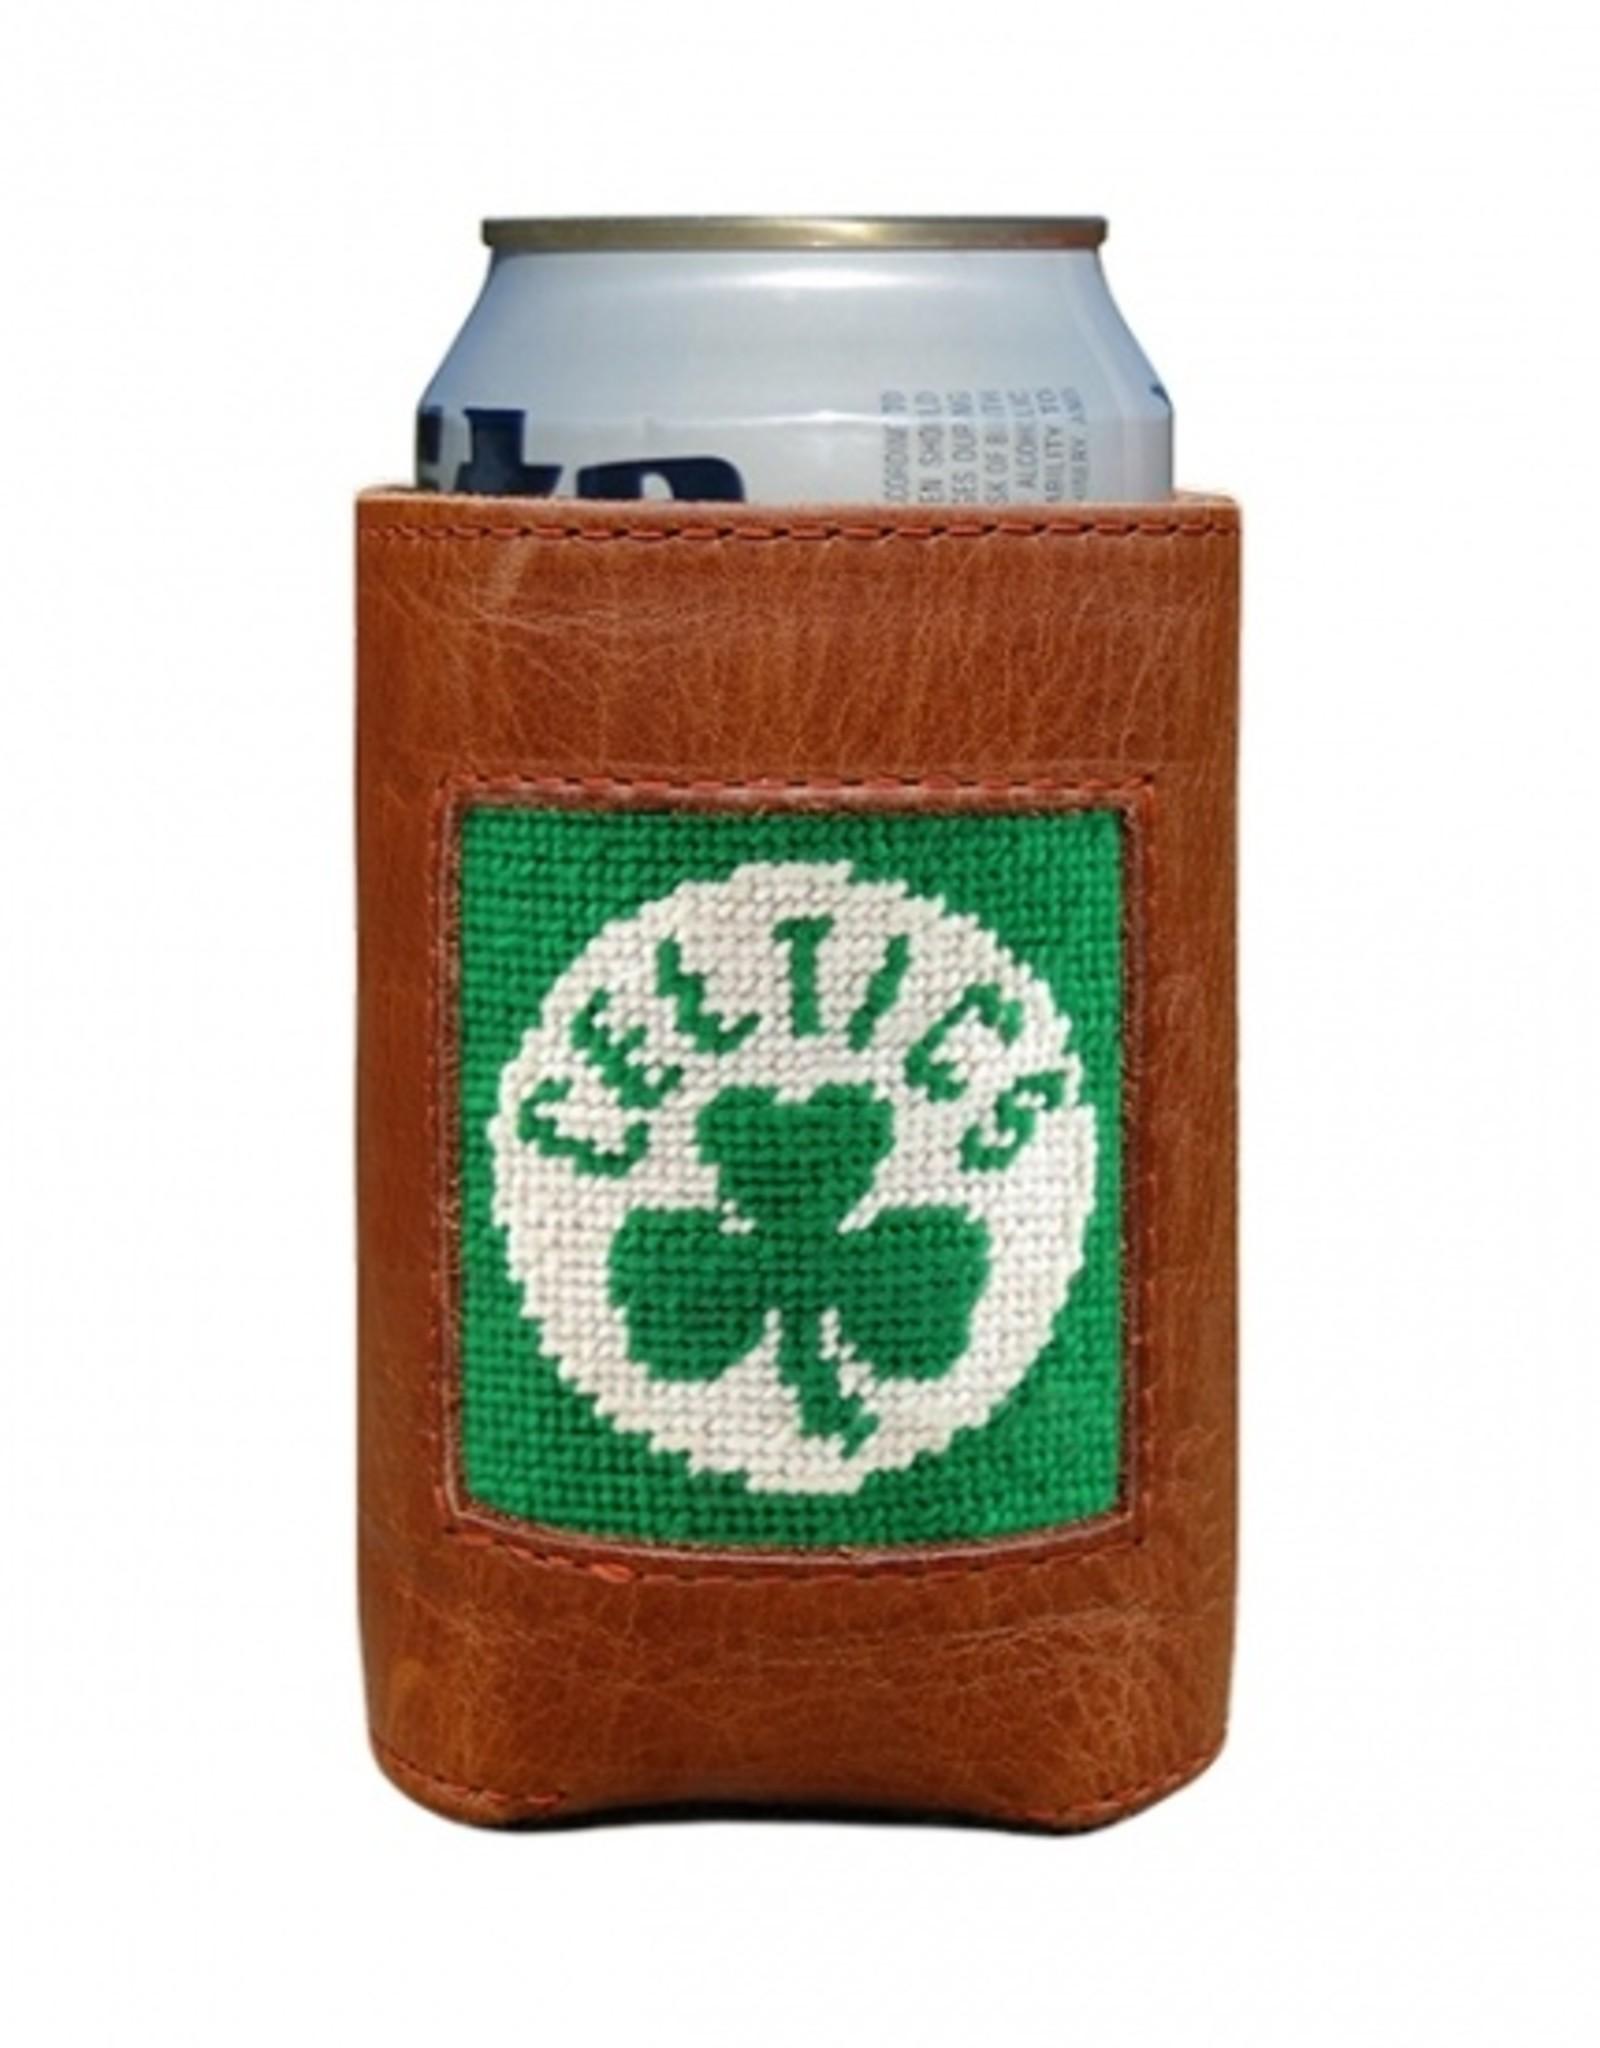 Smathers & Branson Smathers & Branson - Can Cooler Celtics